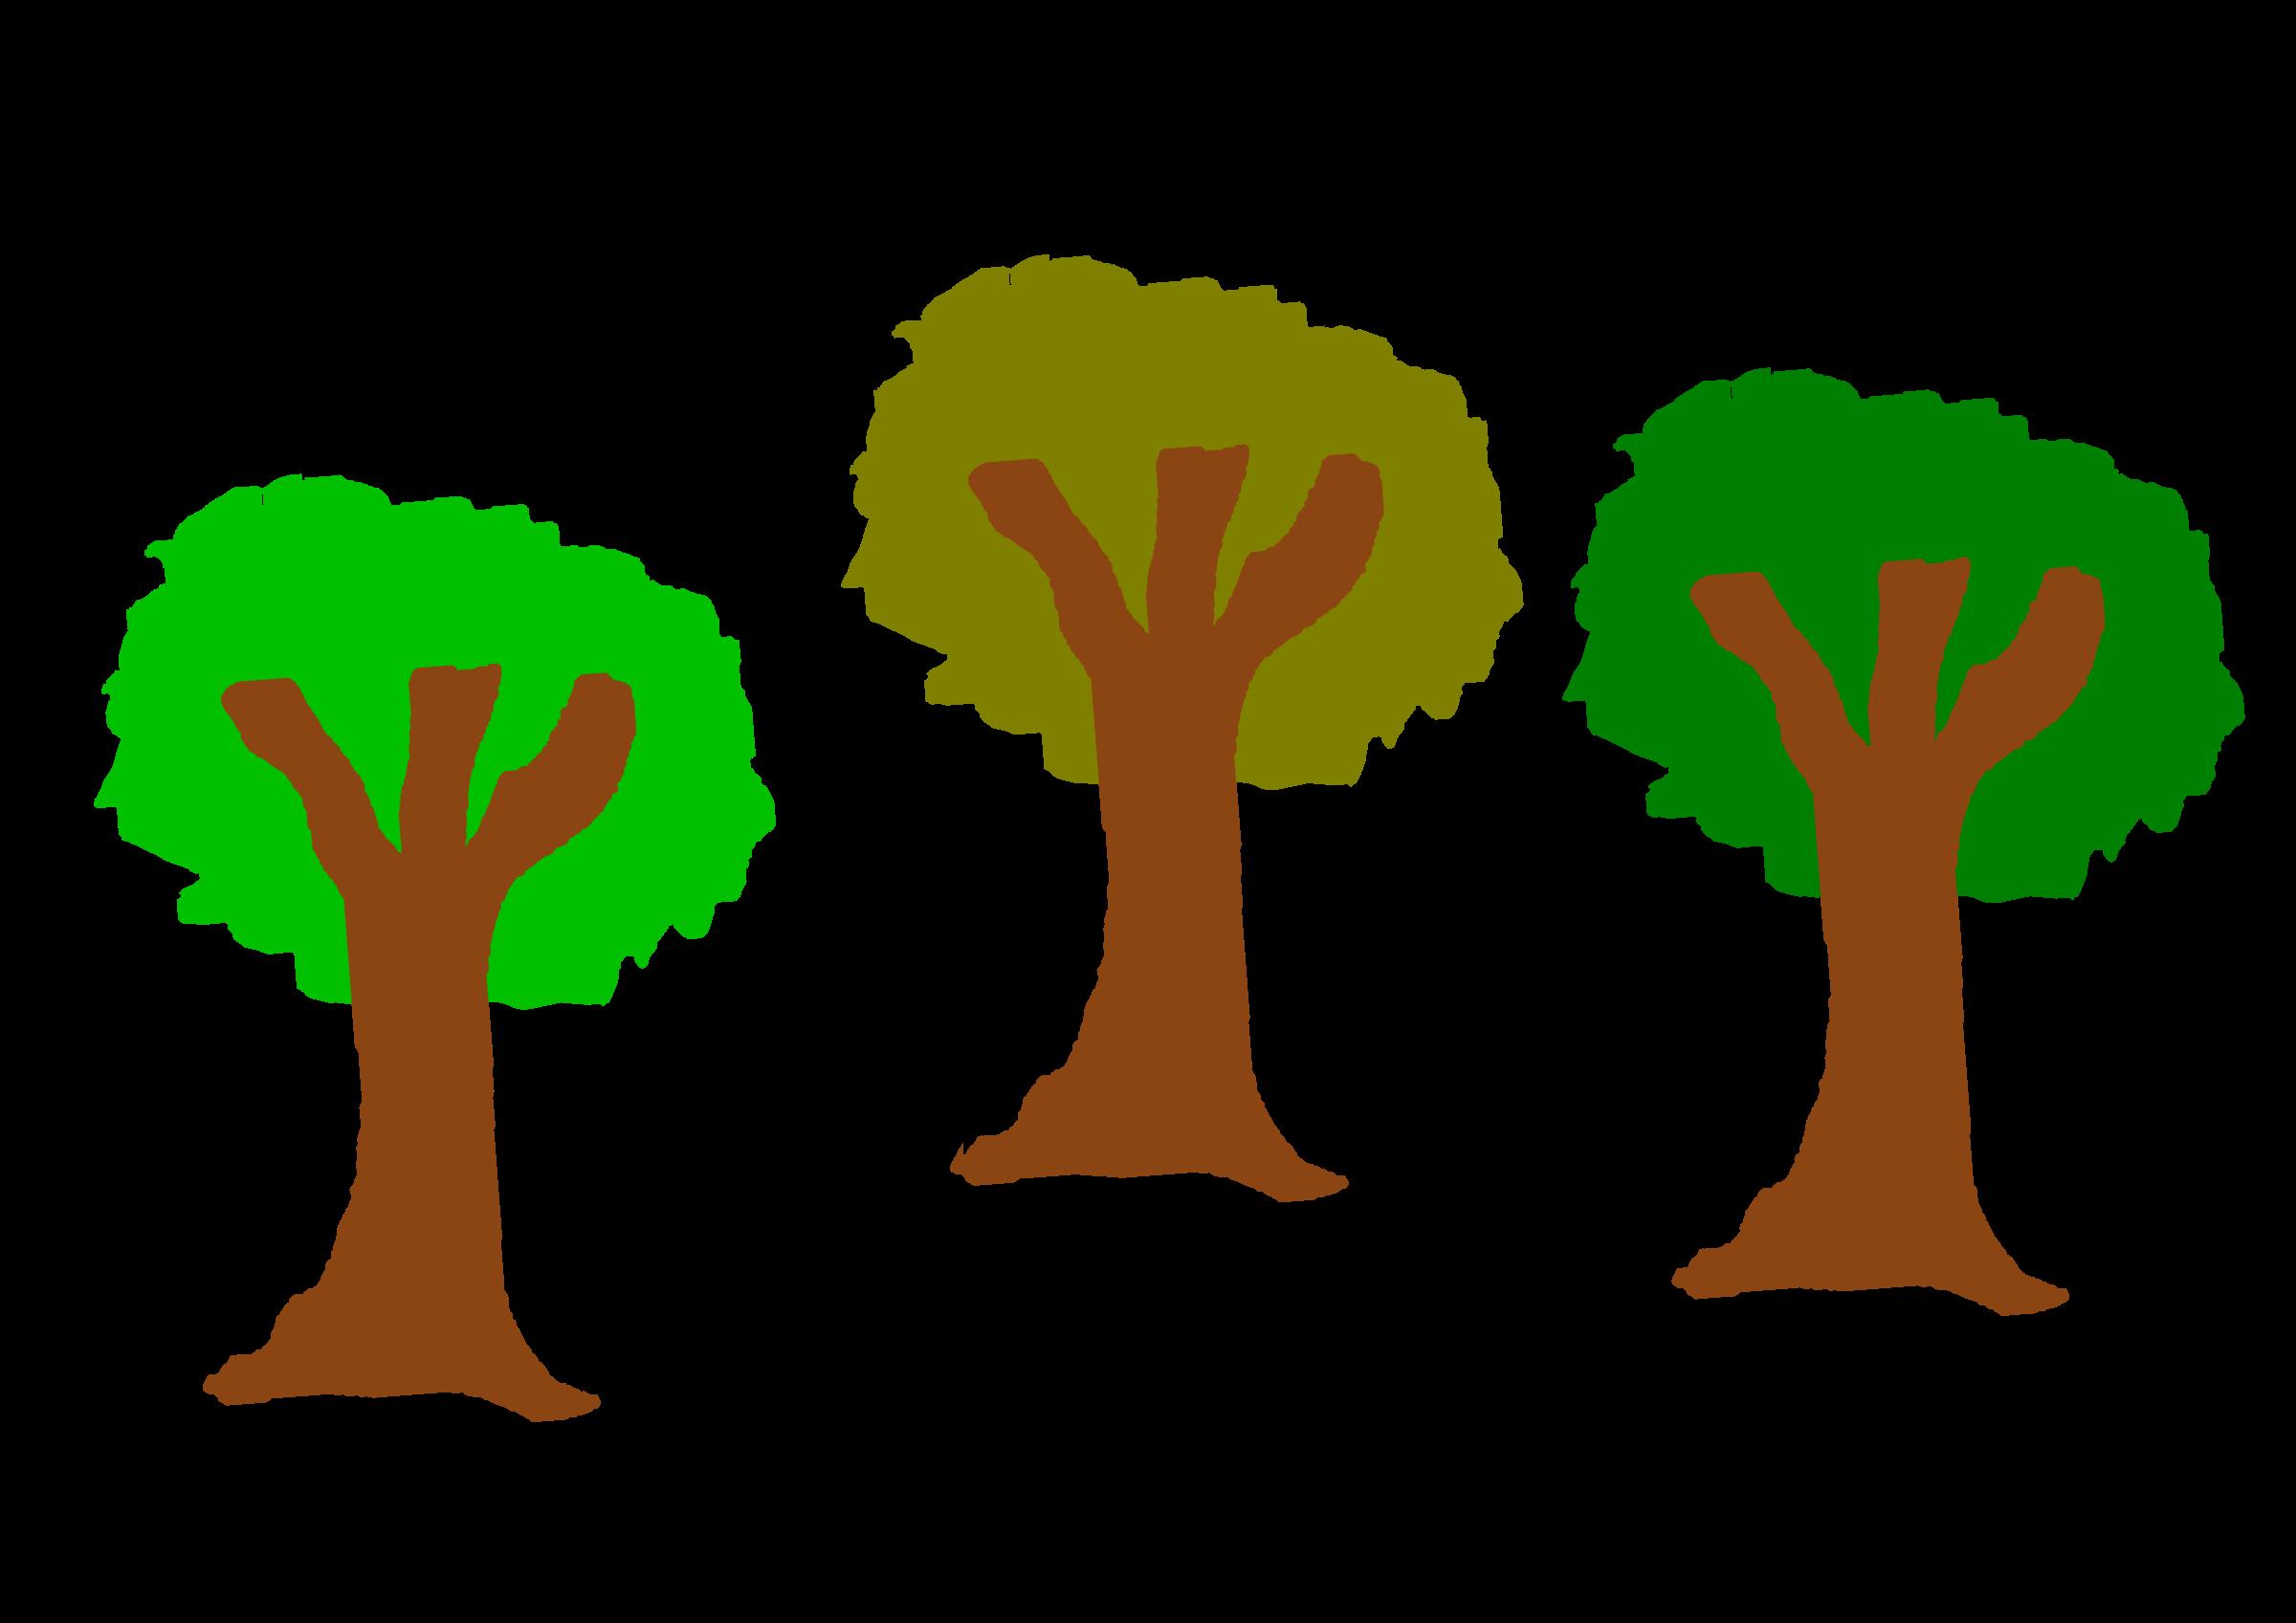 jpg free stock Trees clipart. The three big image